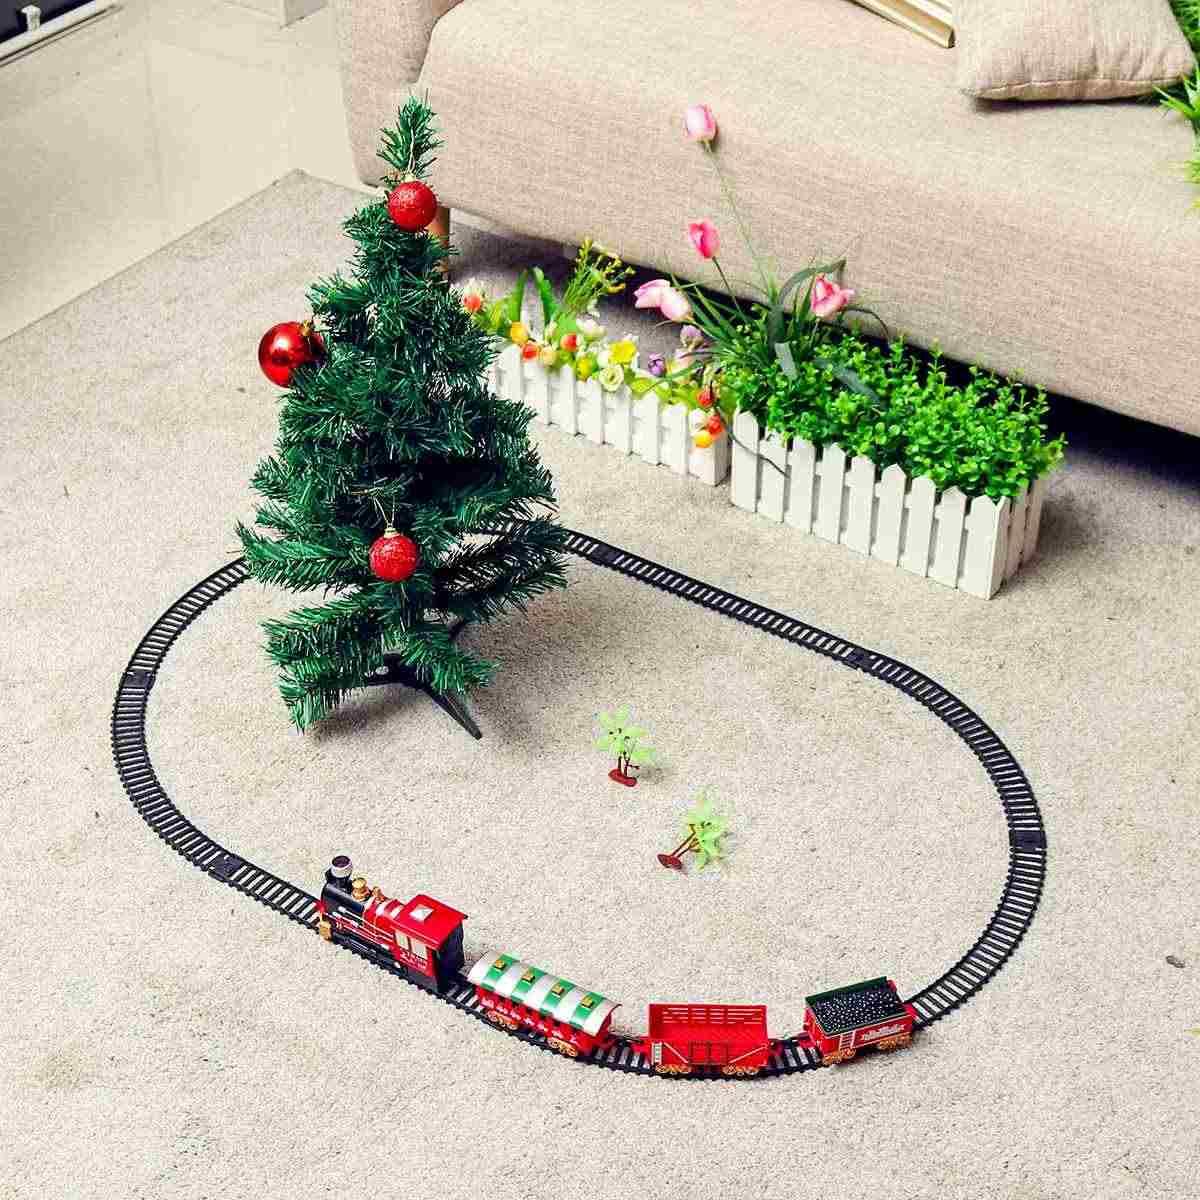 Natal Rel Listrik Mobil Kereta Mainan Anak Listrik Mainan Kereta Api Set Balap Transportasi Jalan Bangunan Hadiah